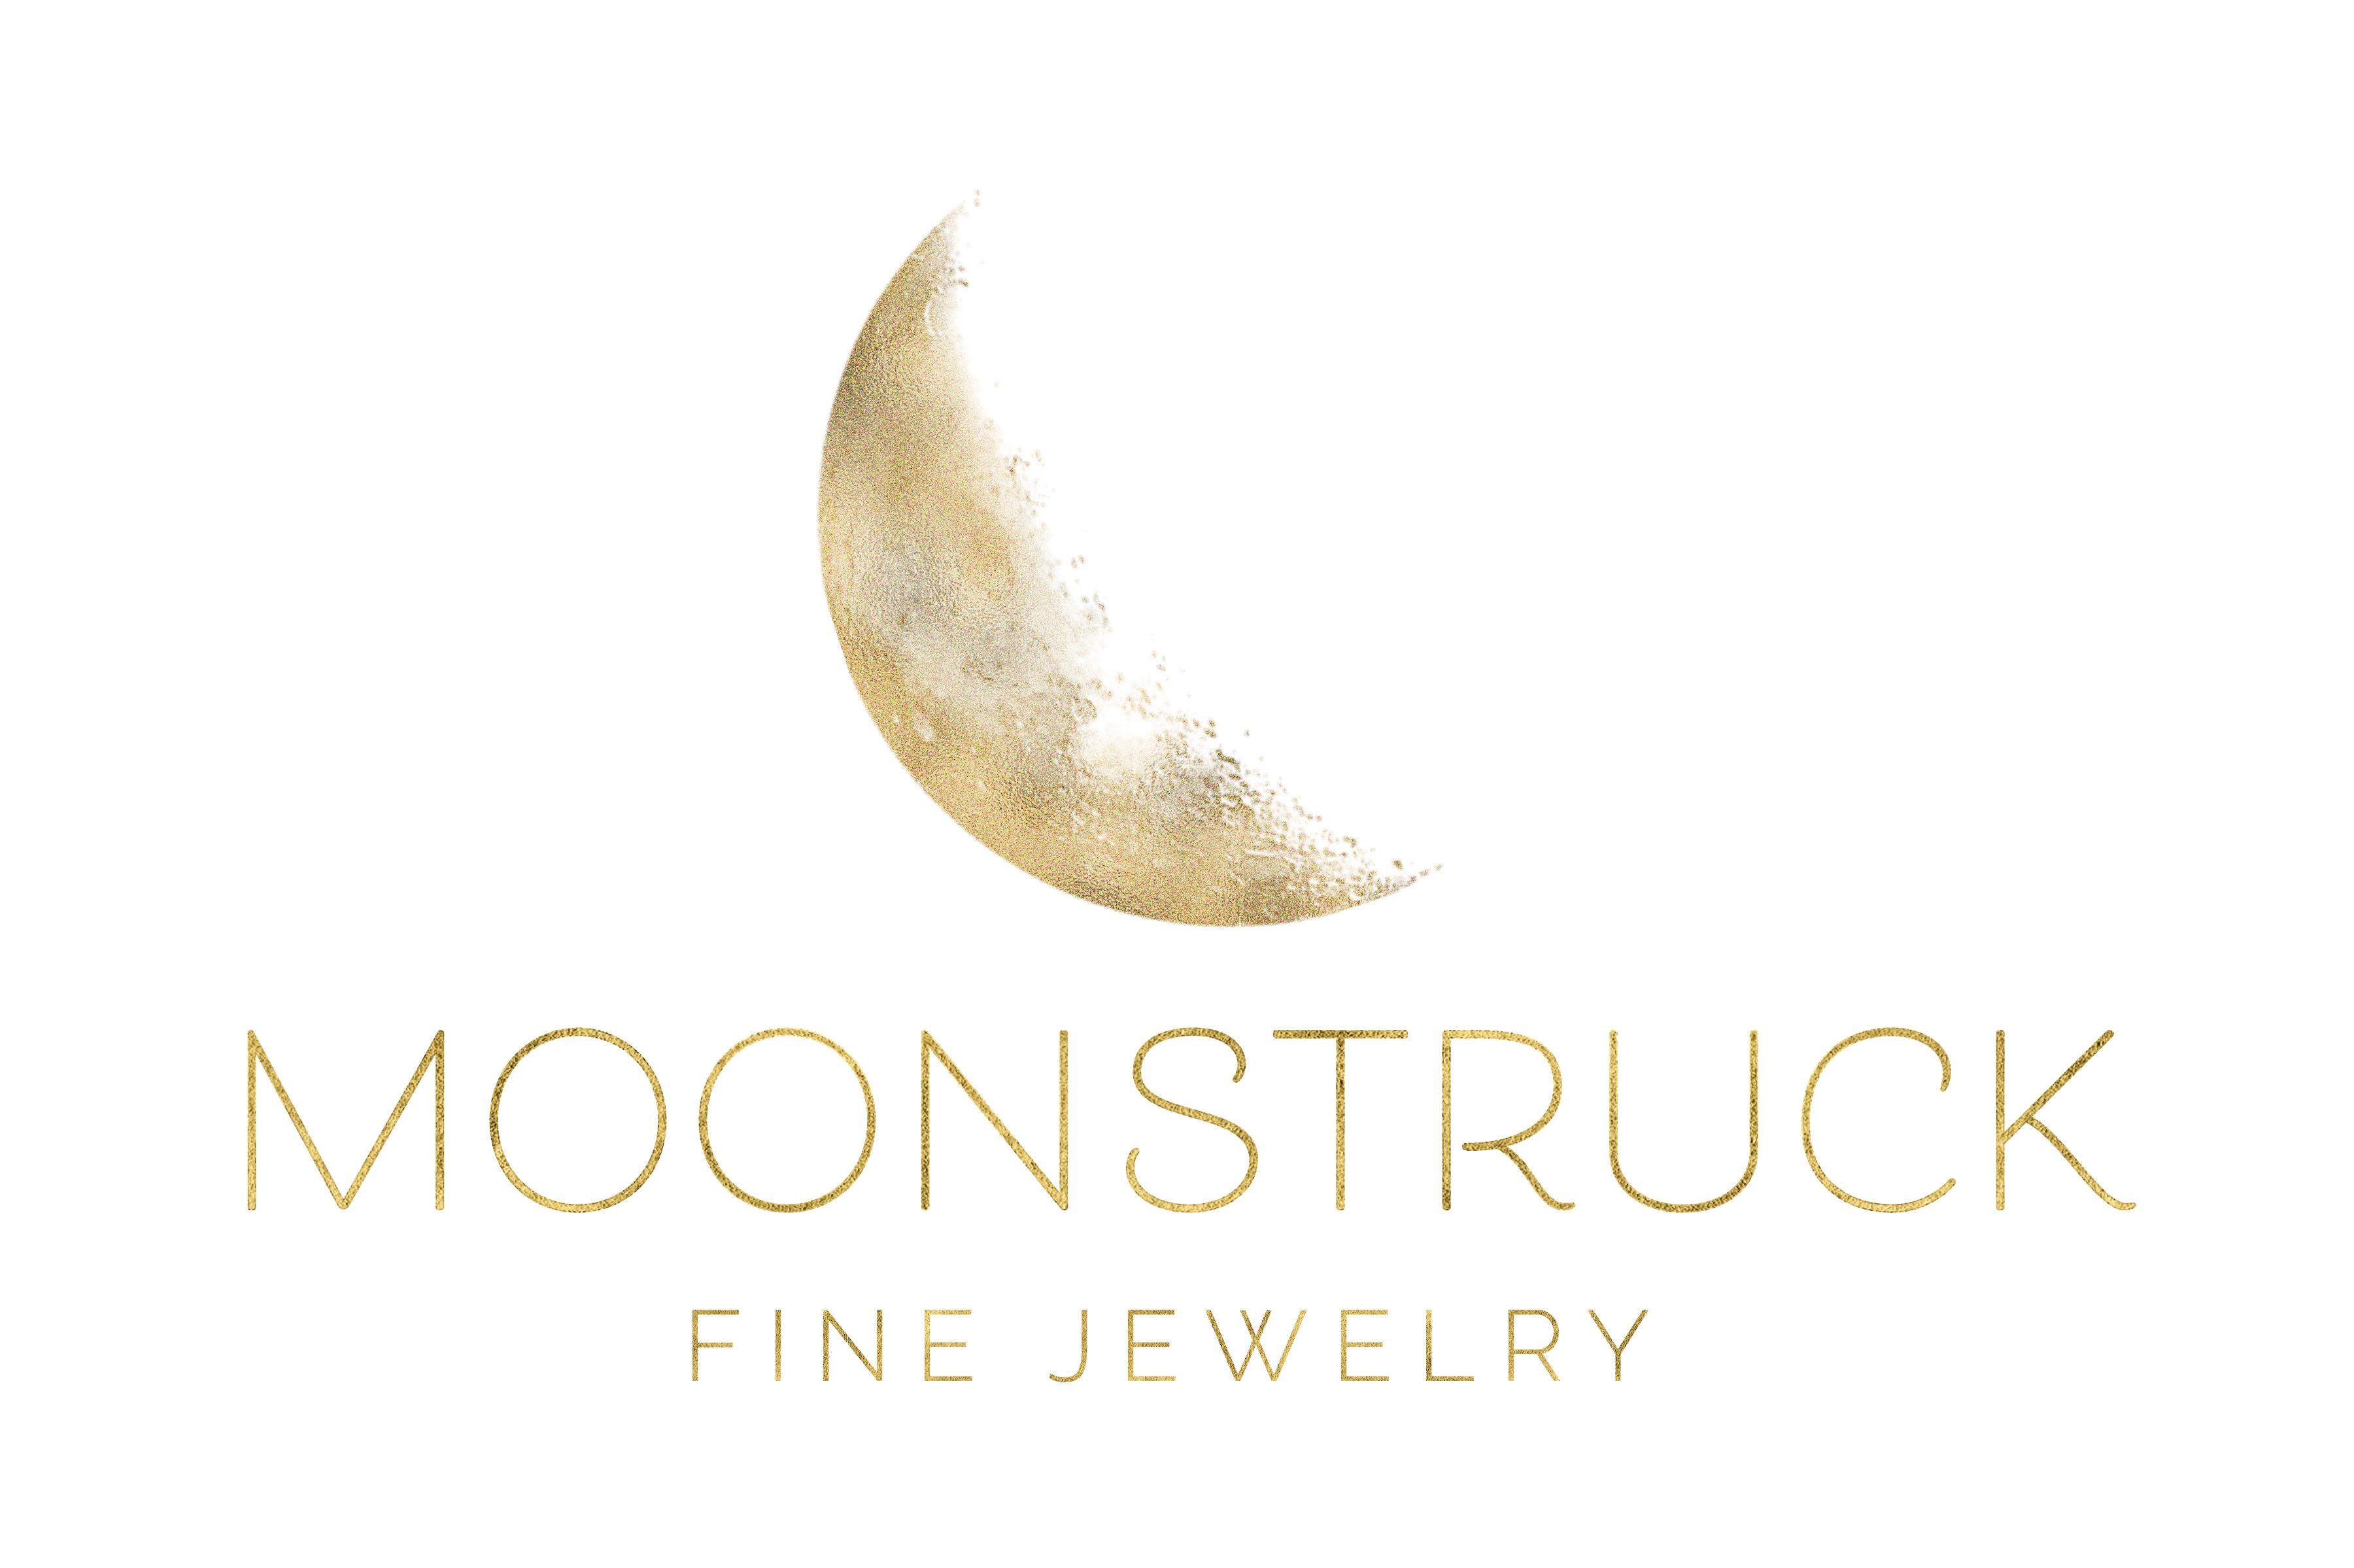 Moonstruck Fine Jewelry